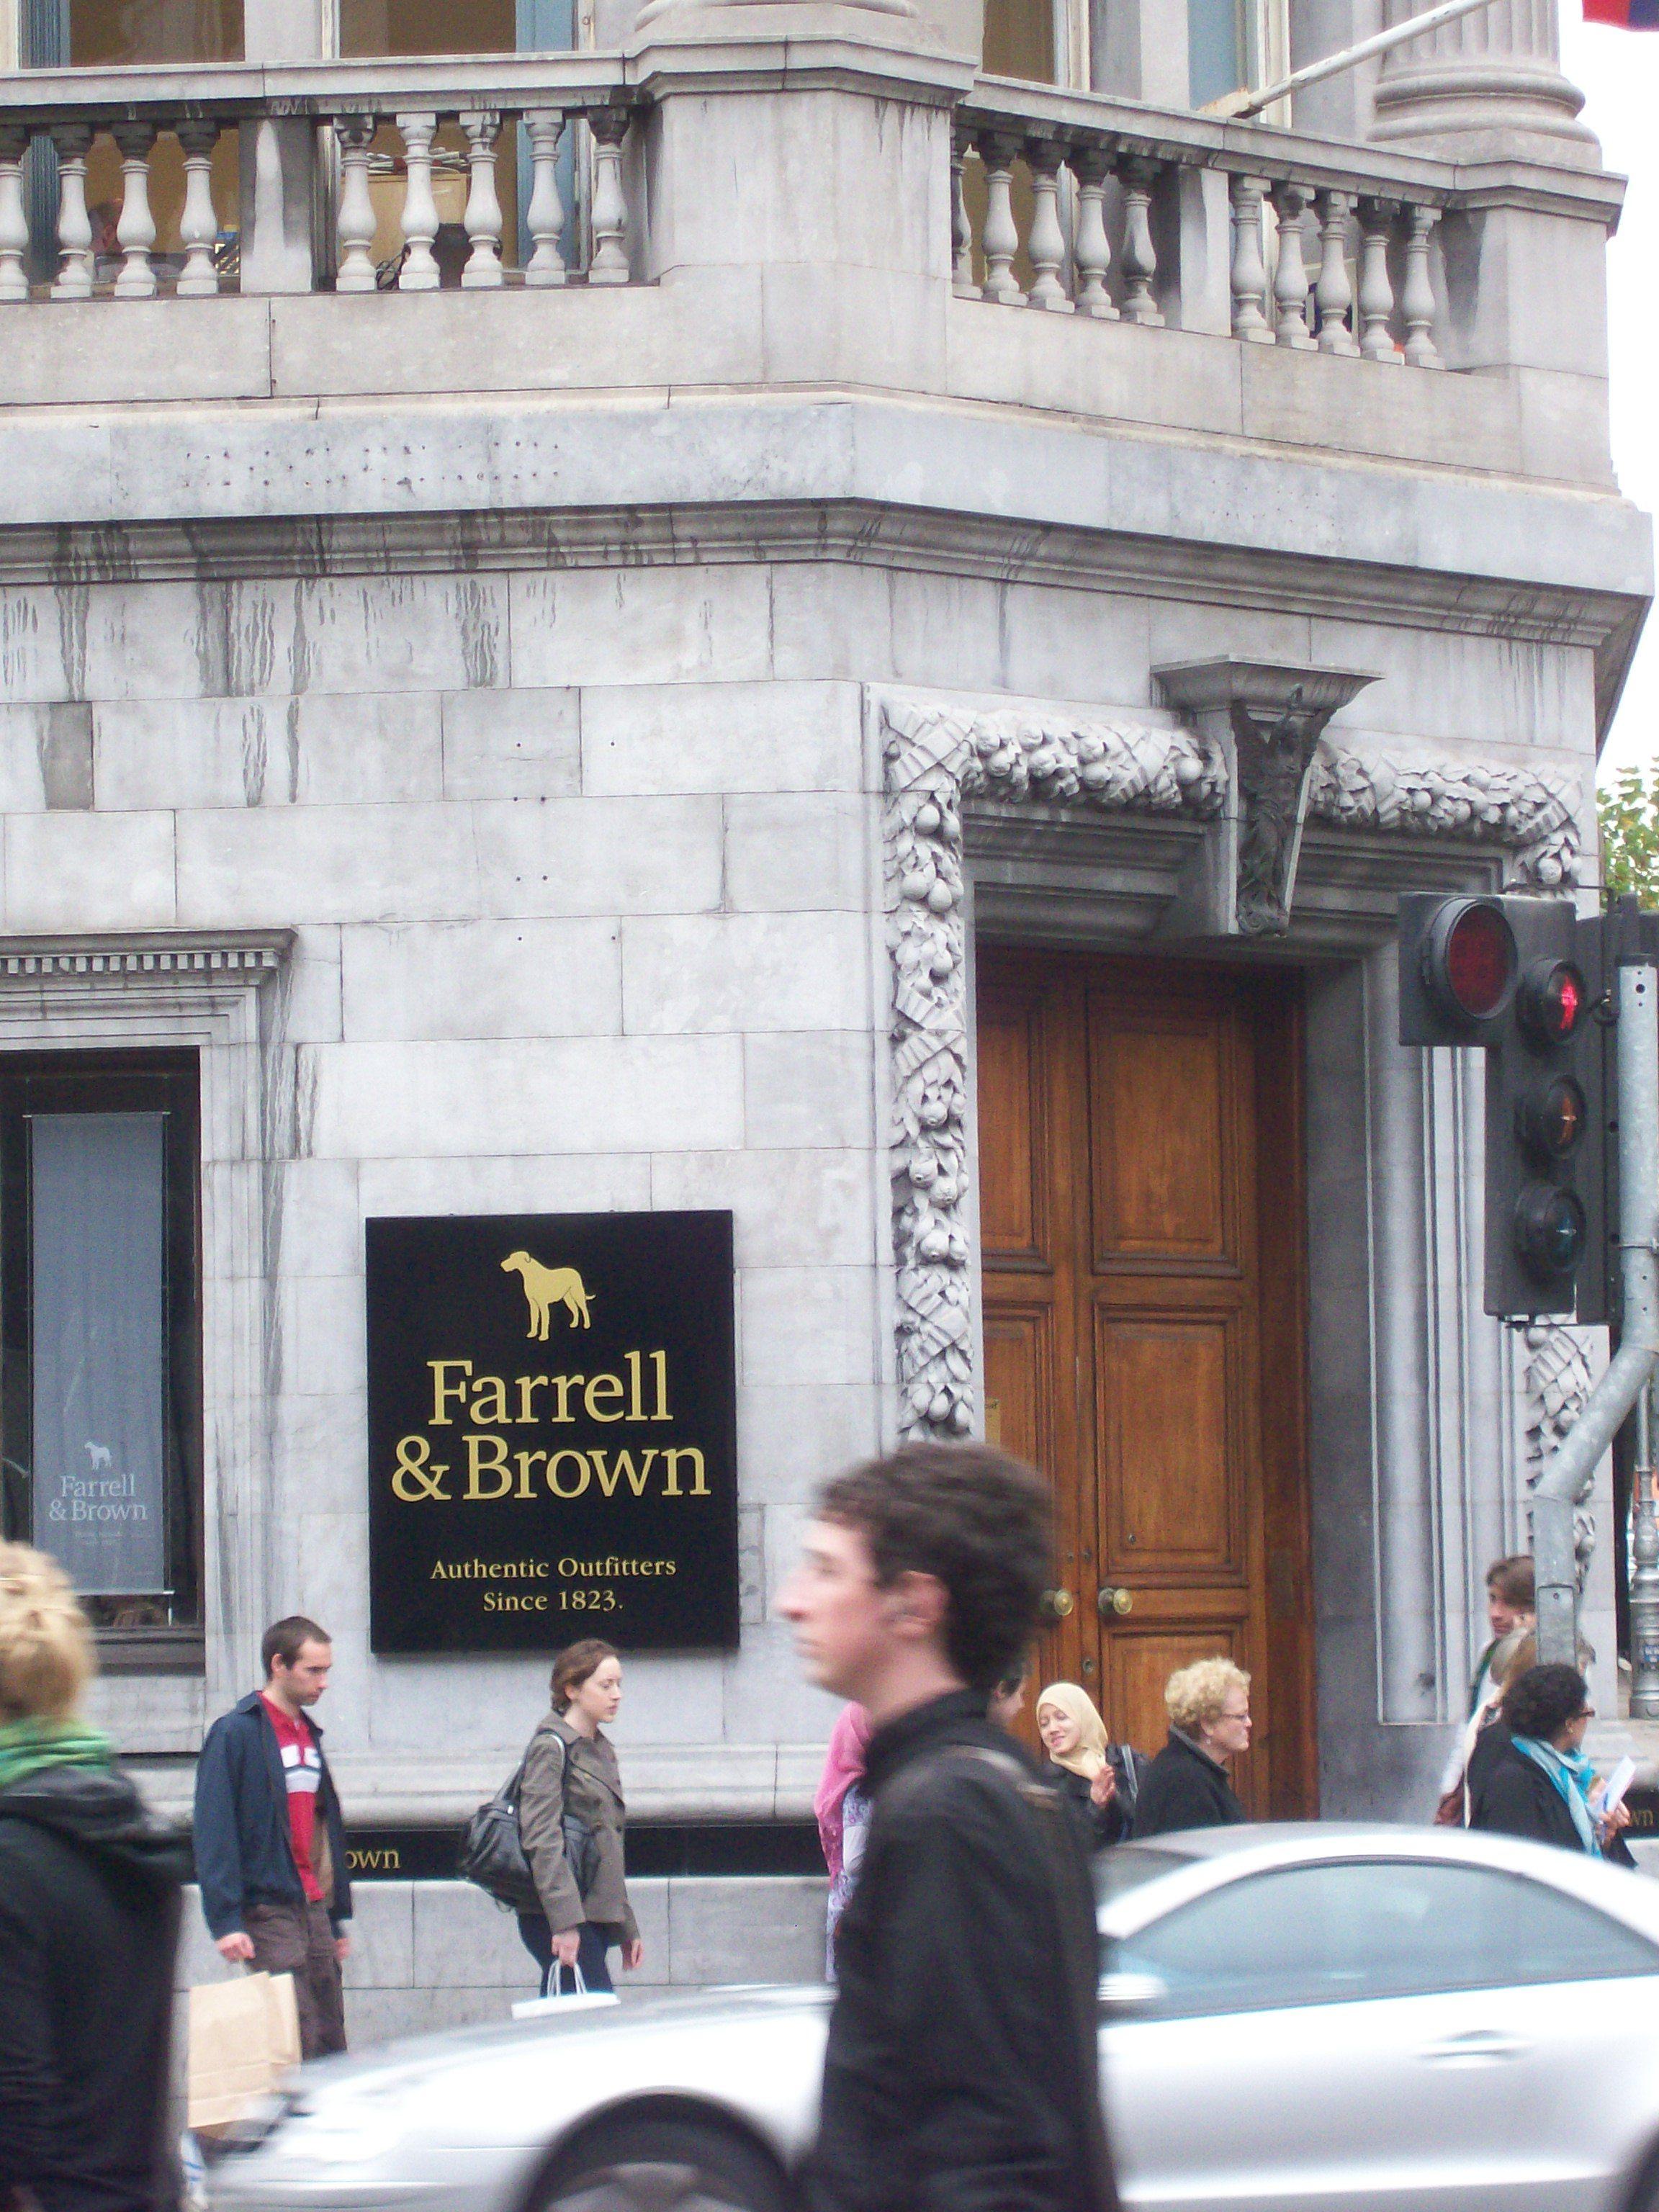 Dublin department store - Farrell & Brown Irish wolfhound logo!